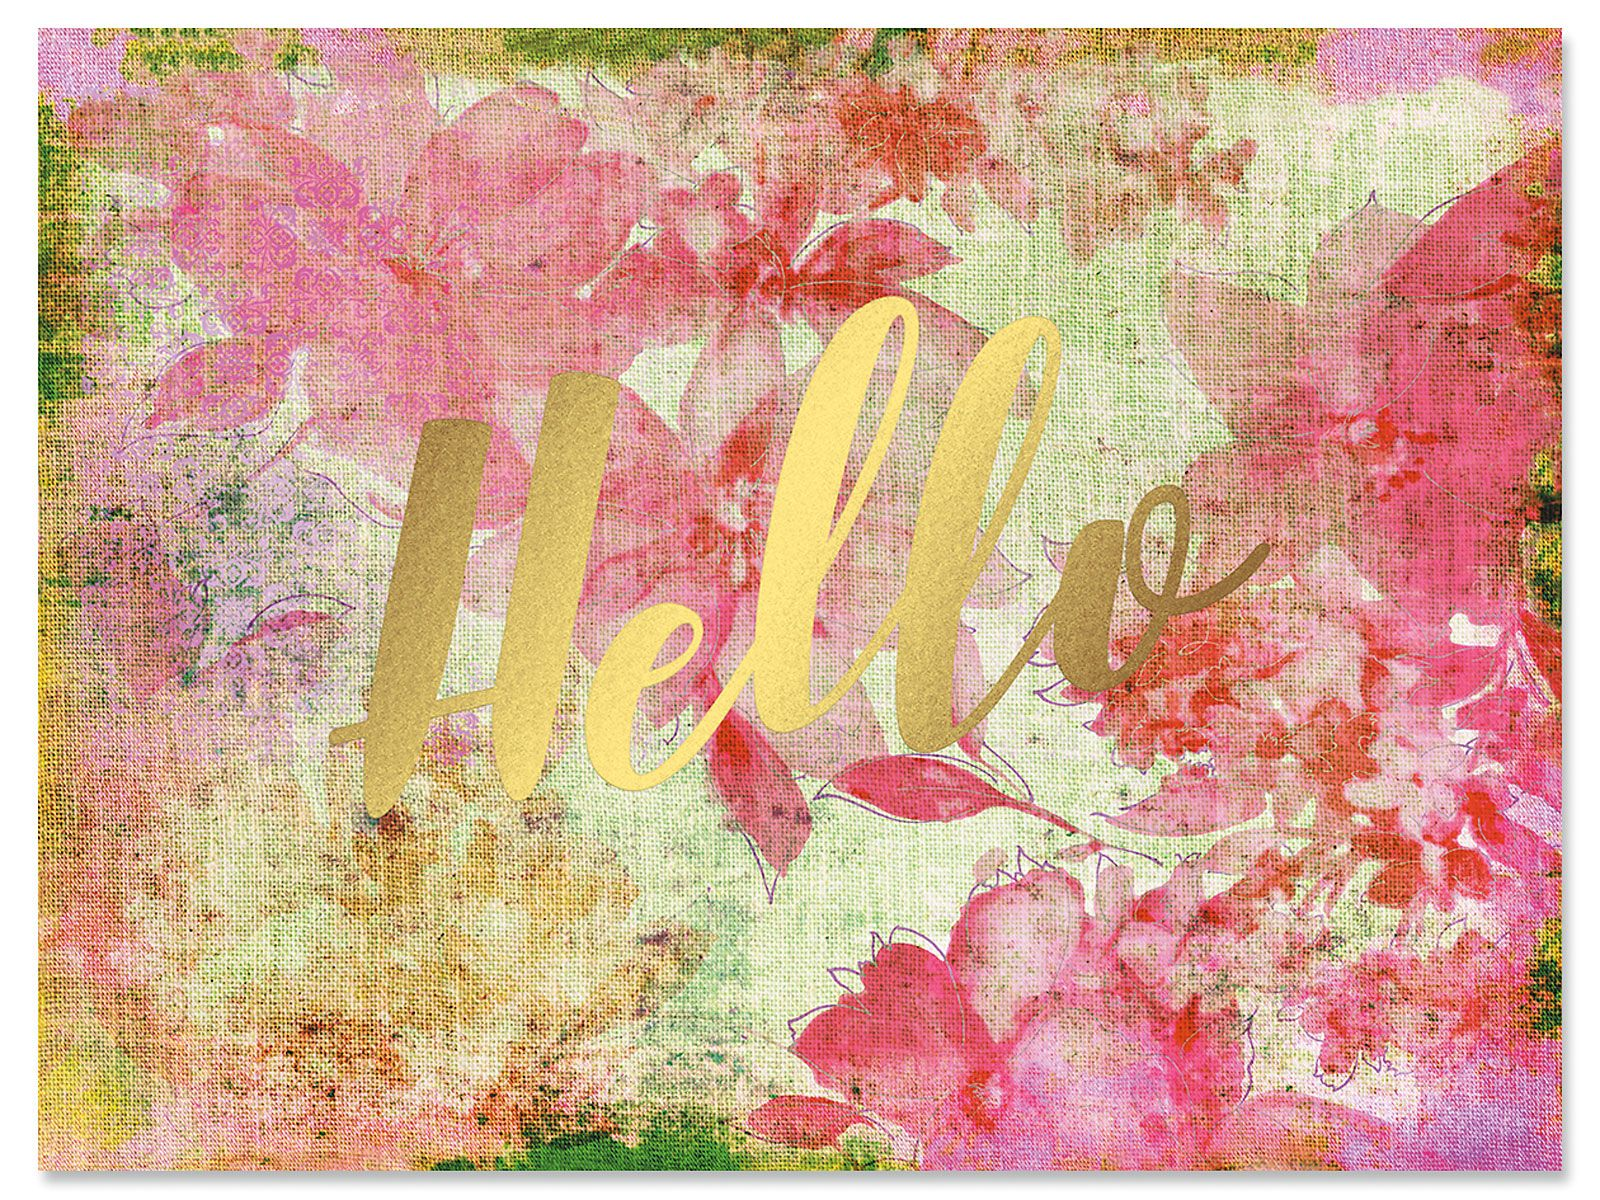 Floral Hello Notecard - BOGO